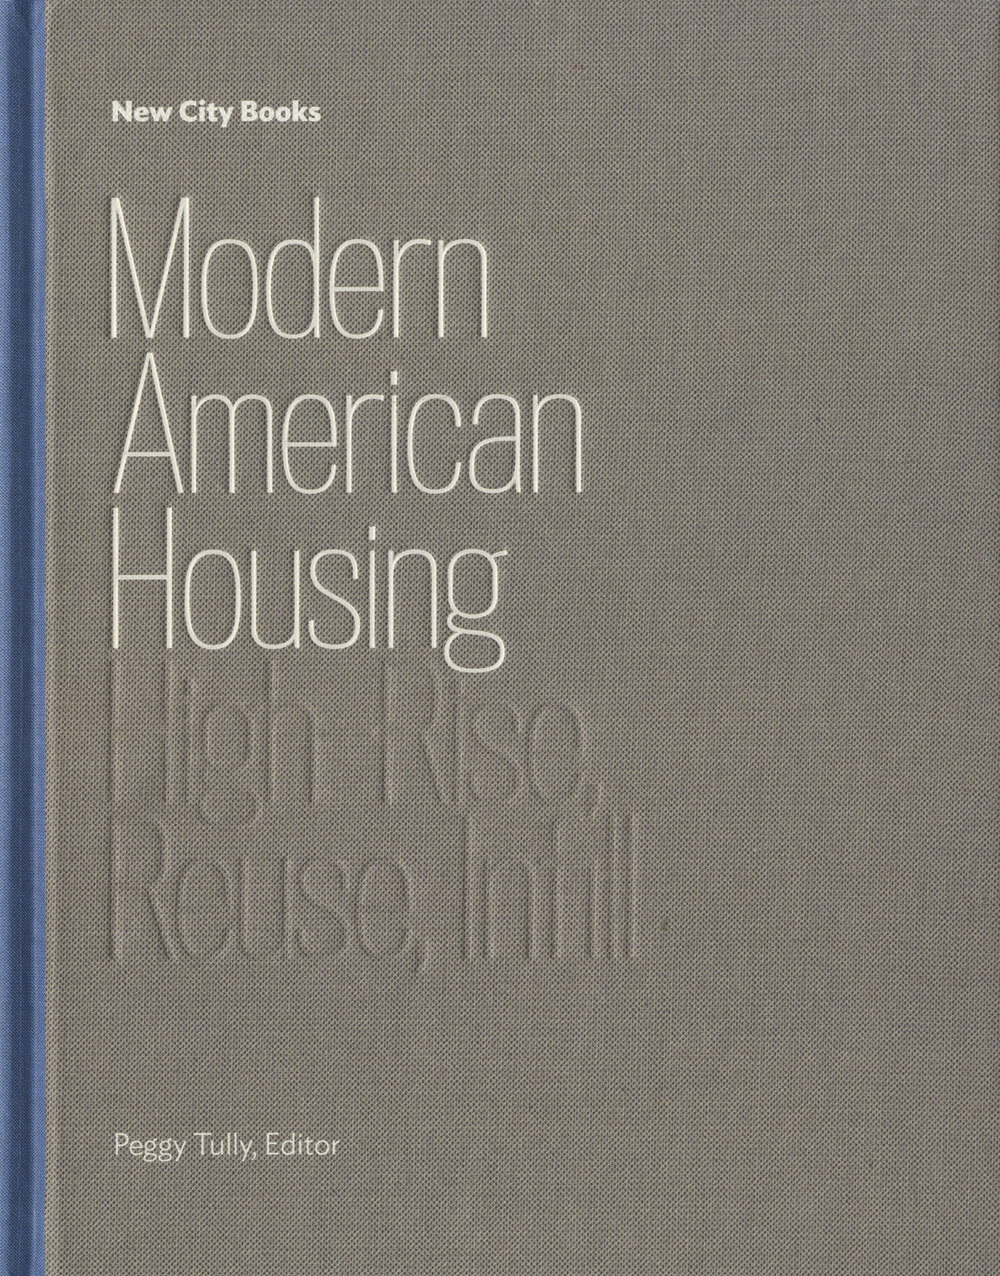 Modern American Housing,